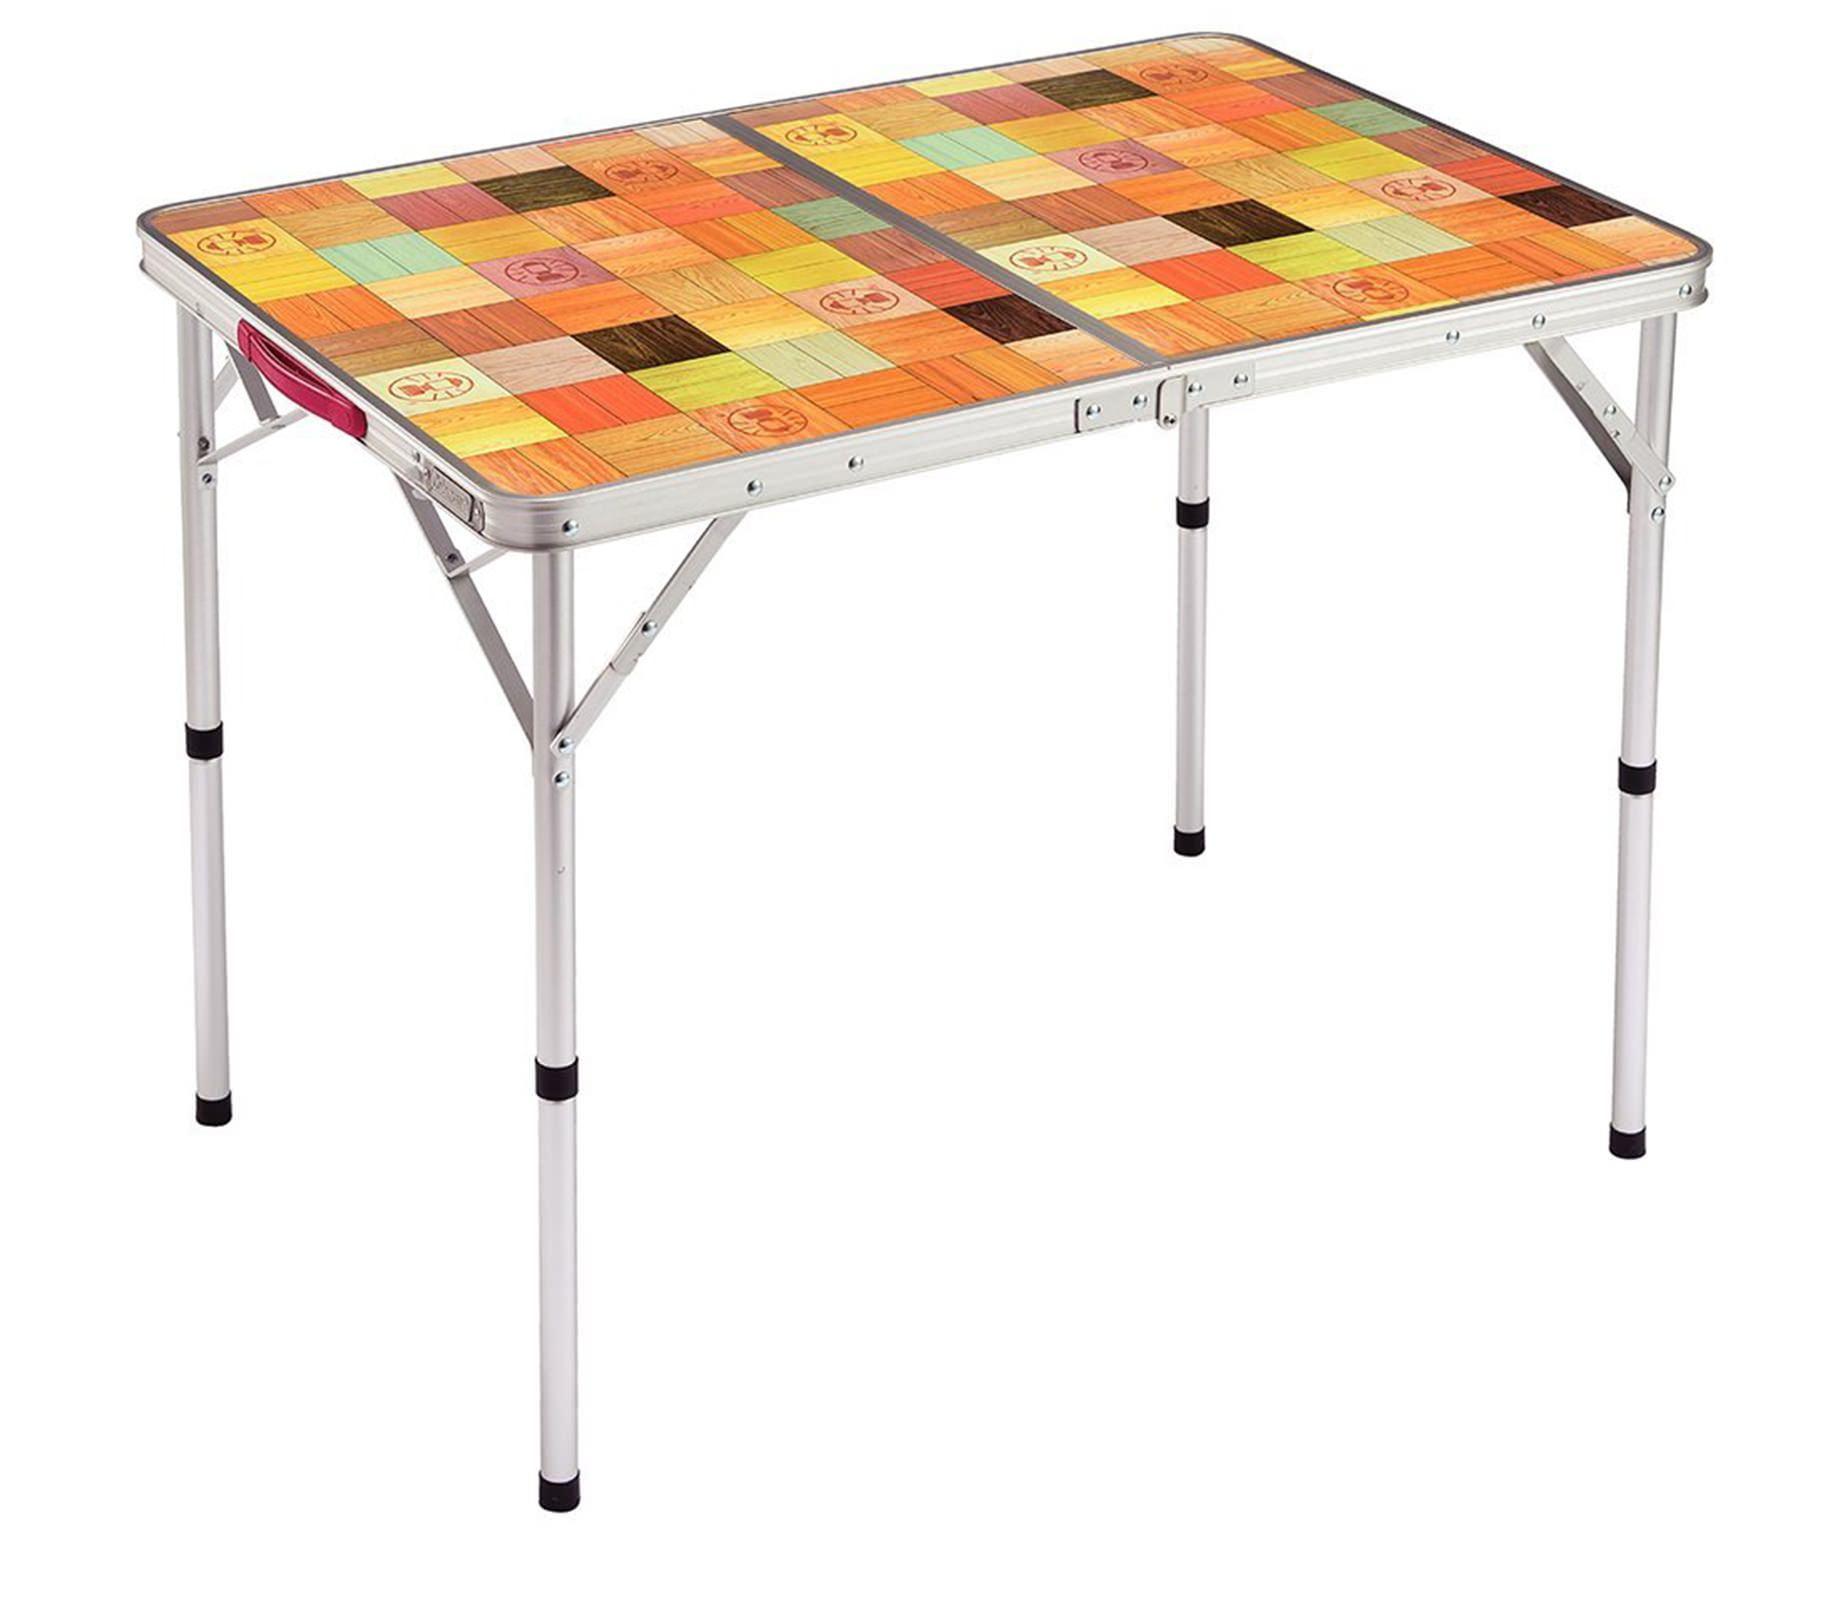 Bàn gấp Mosaic 90 Coleman Natural Mosaic Living Room Table 2000026752 - 7445